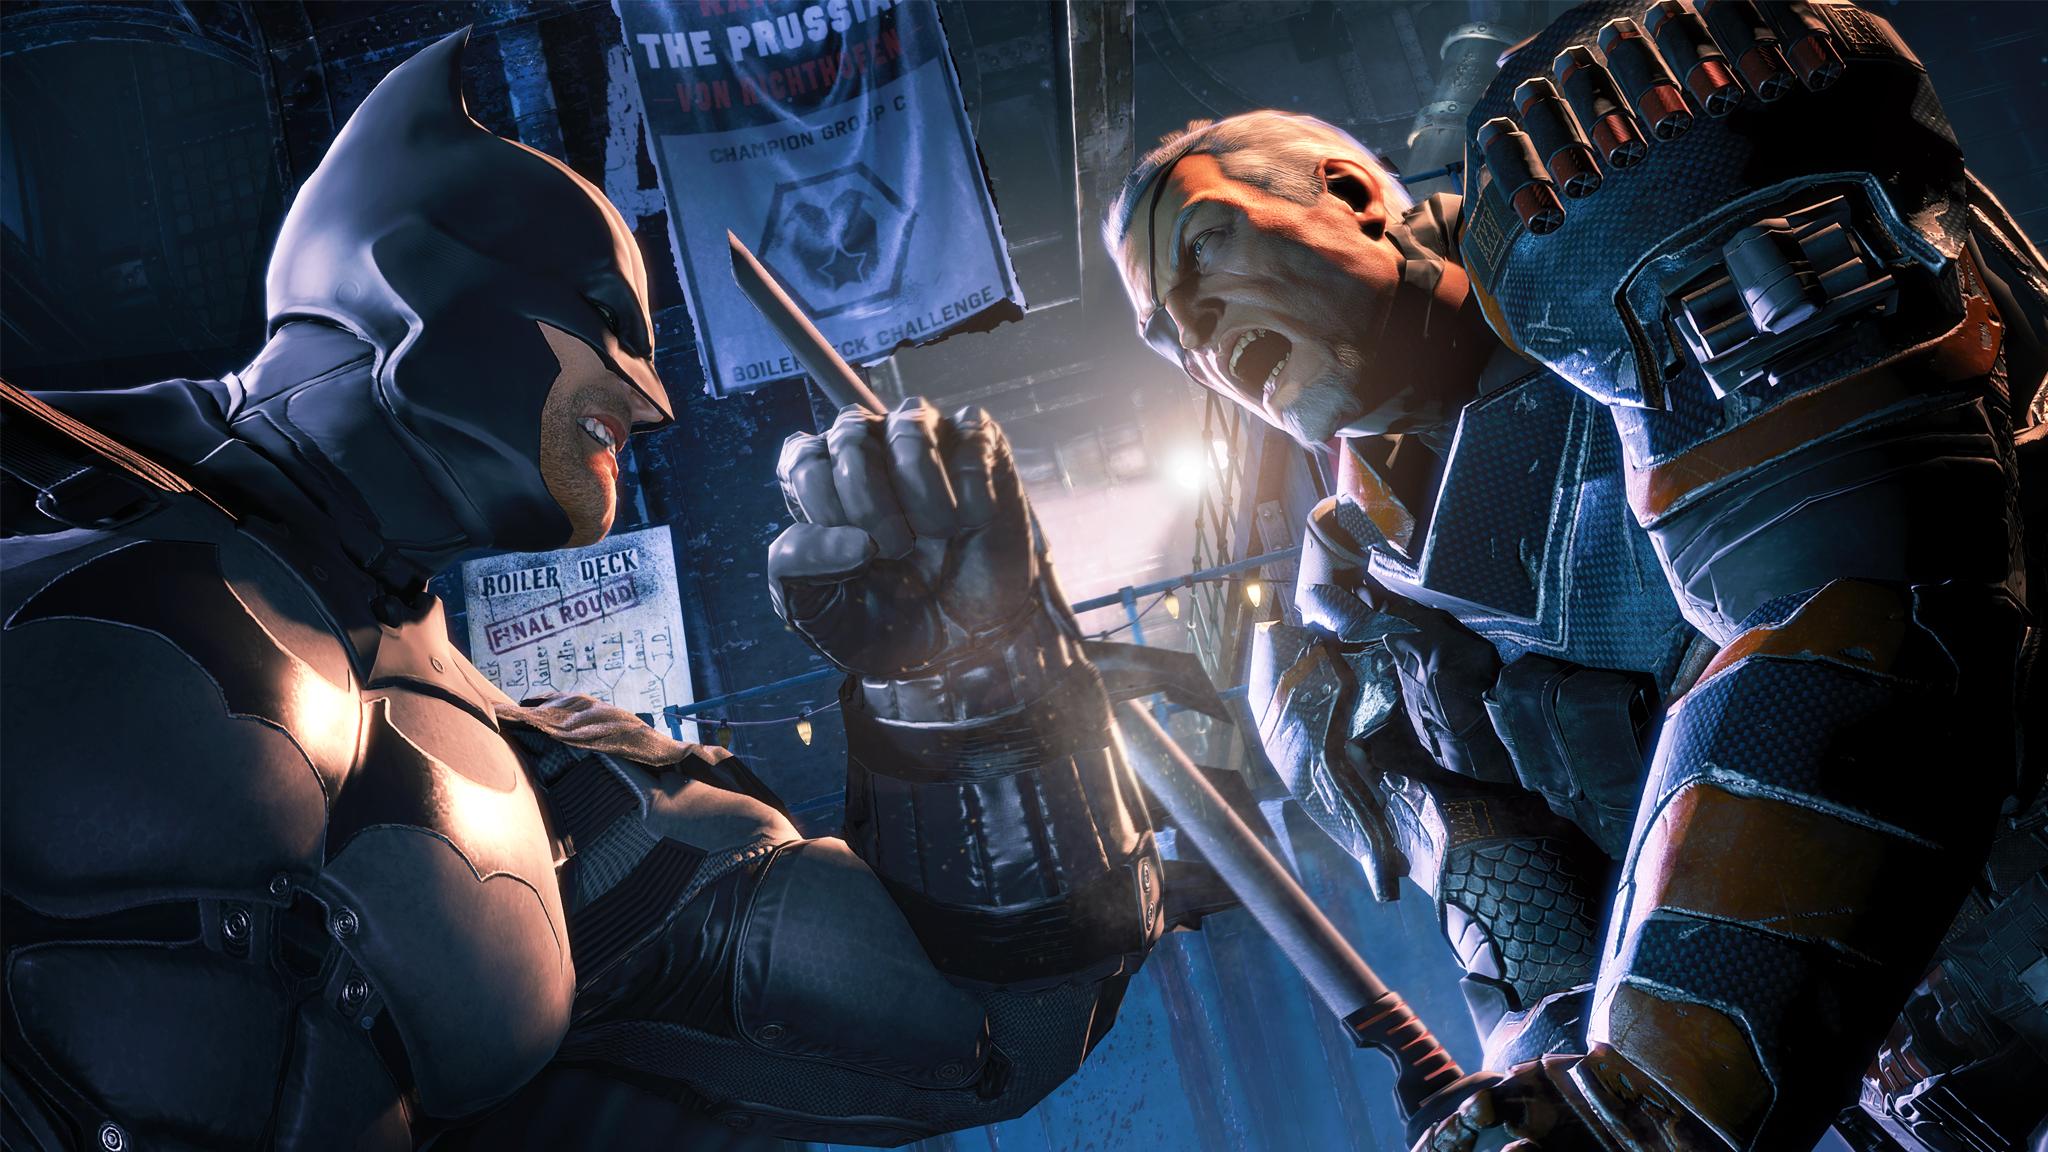 dethstroke video game wallpaper - photo #12